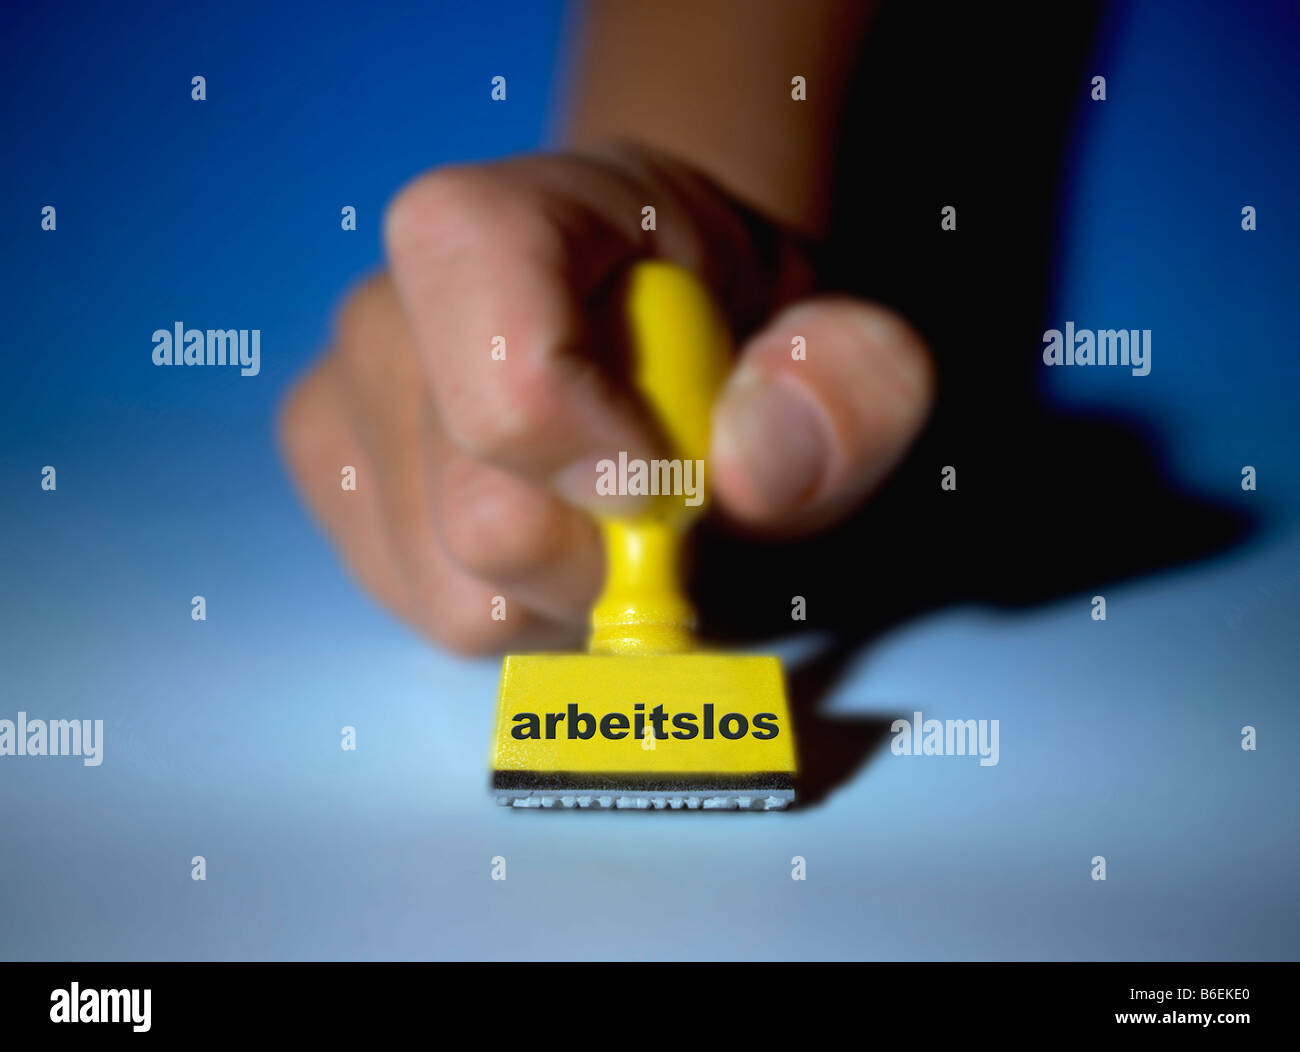 digital enhancement rubber stamp marked in german arbeitslos - Stock Image